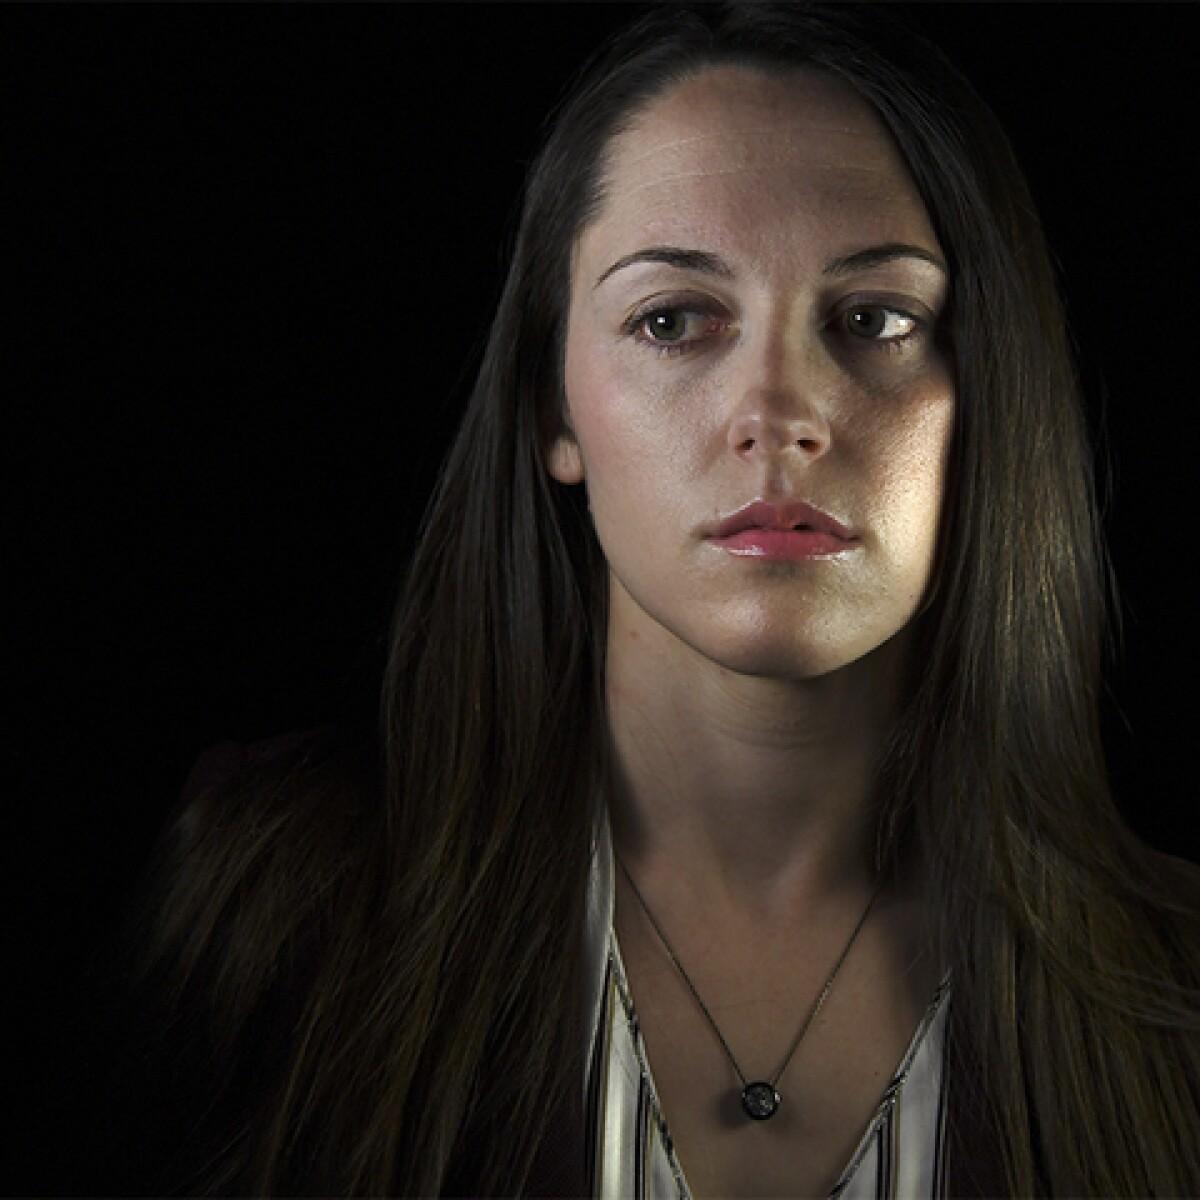 """It's Horrific"": Christopher Watts' Mistress Speaks As"